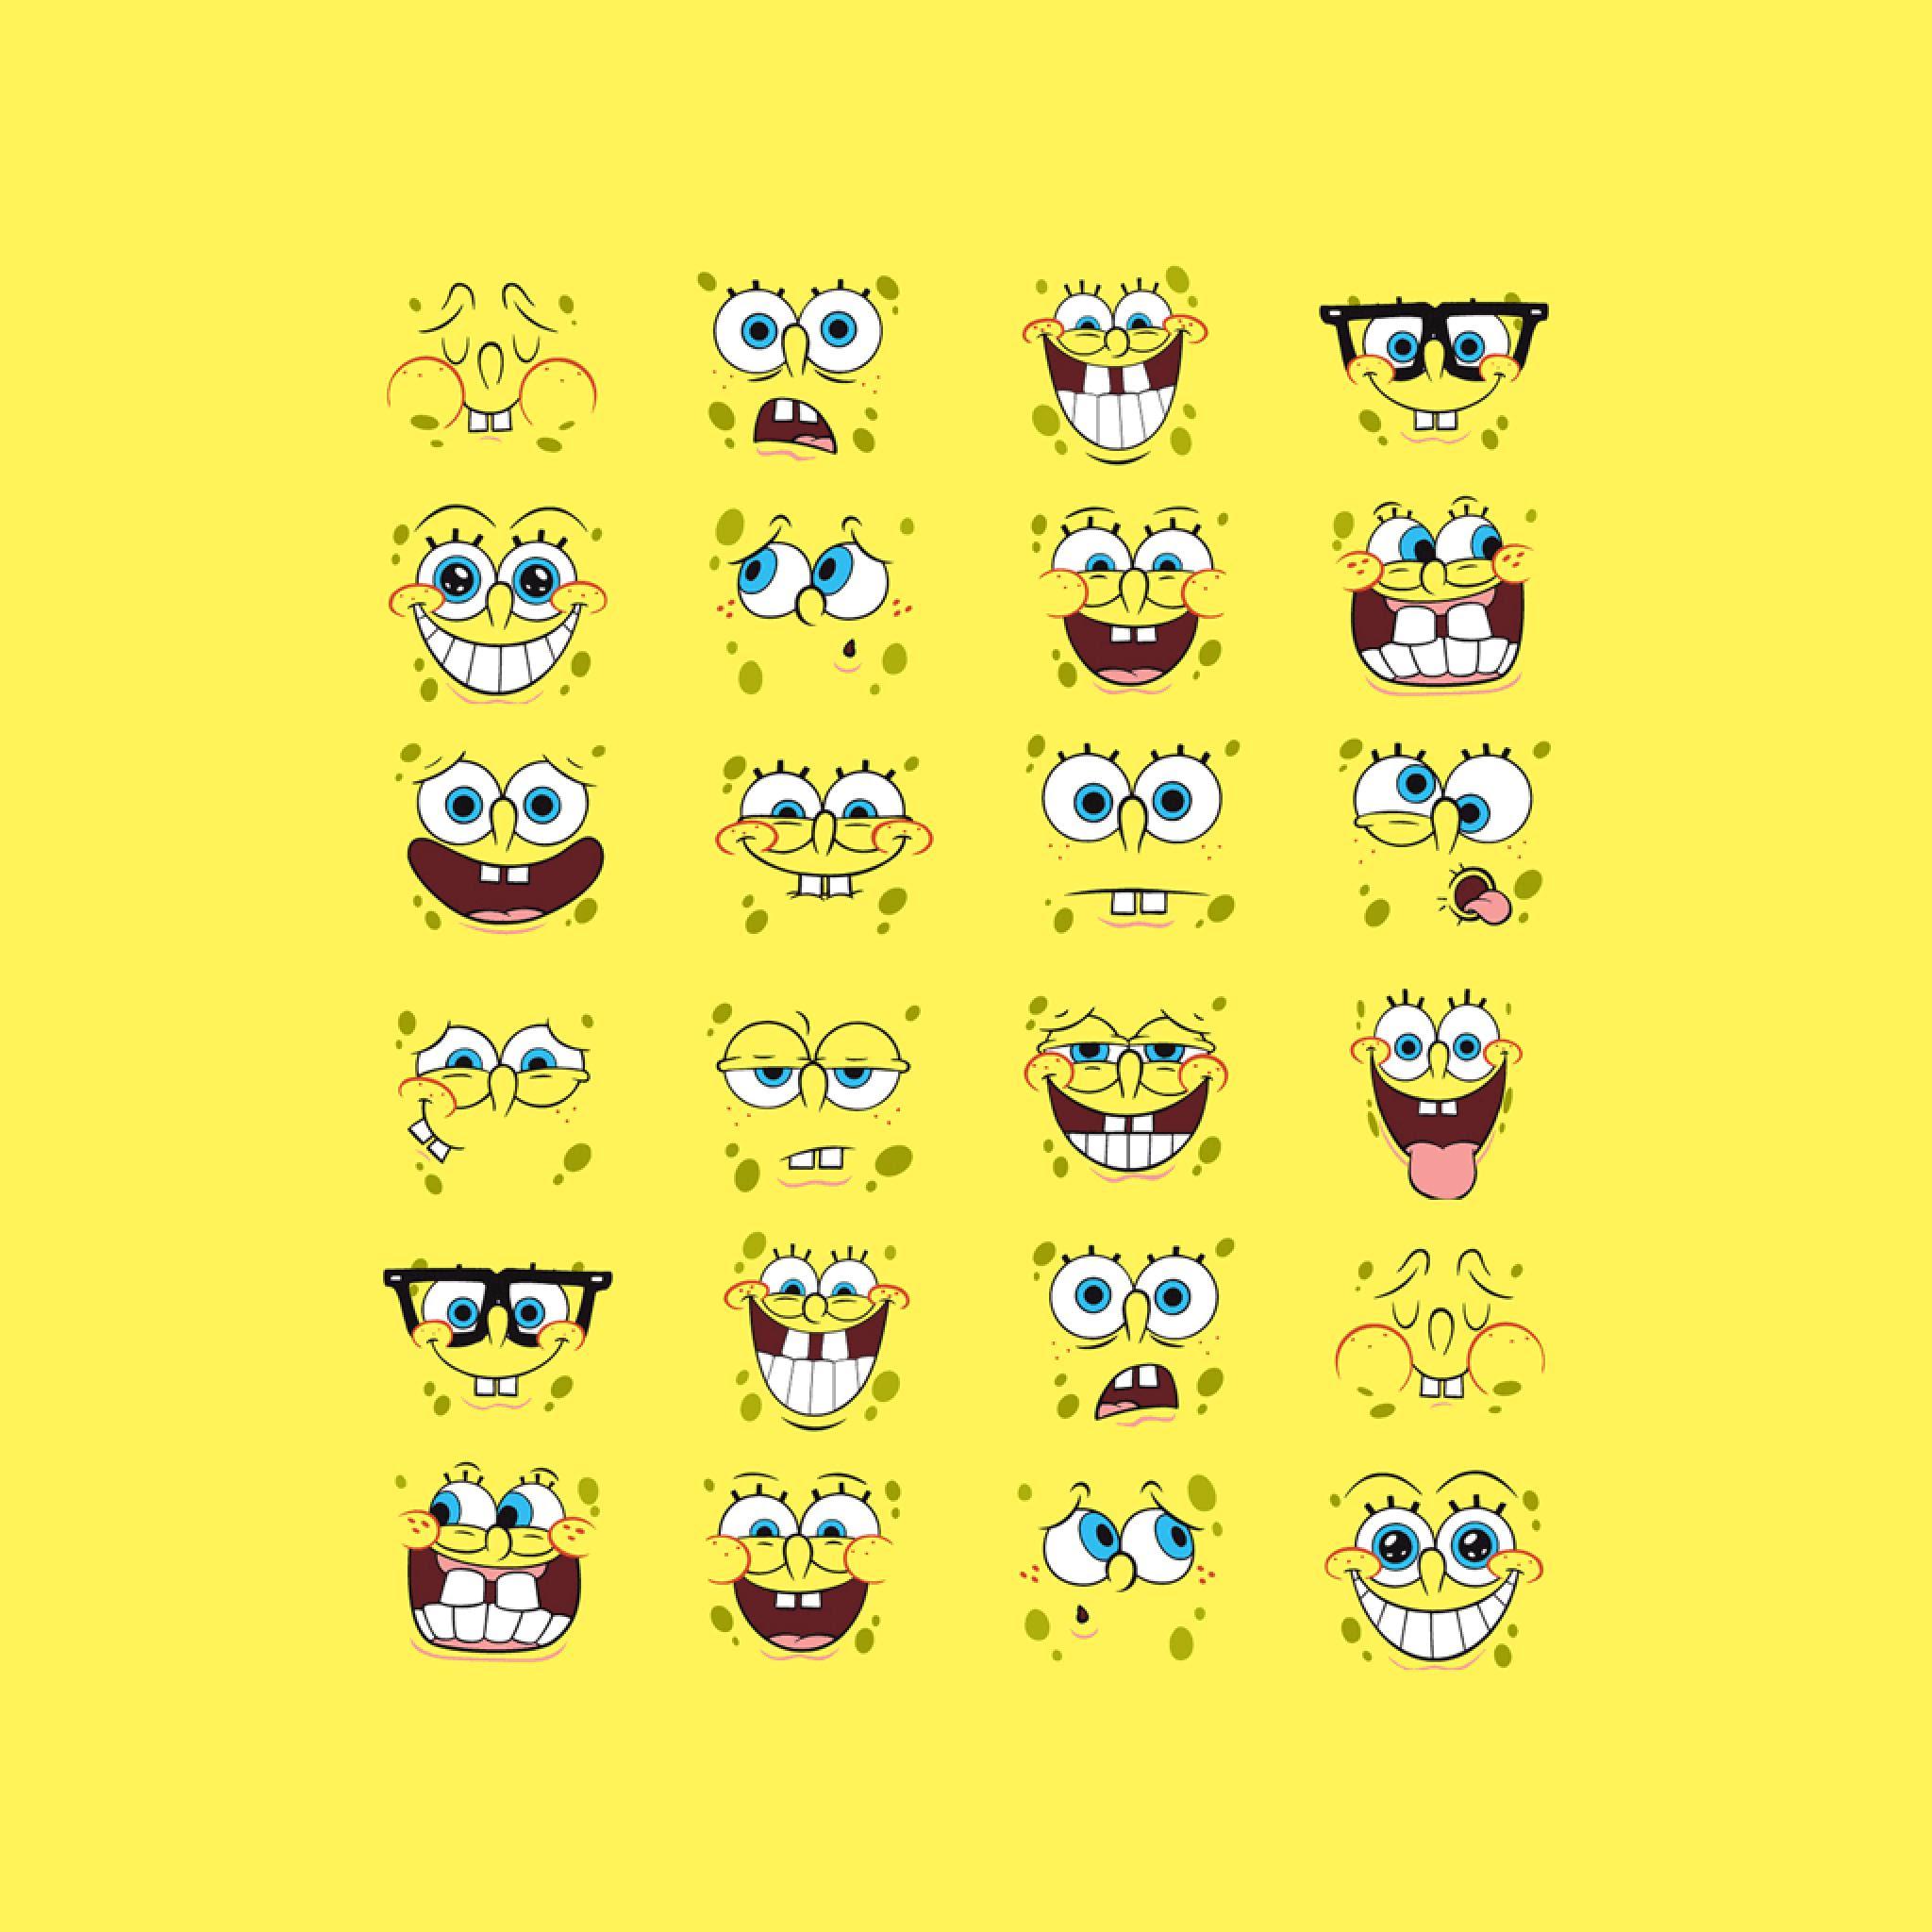 Spongebob Lockscreen Wallpaper